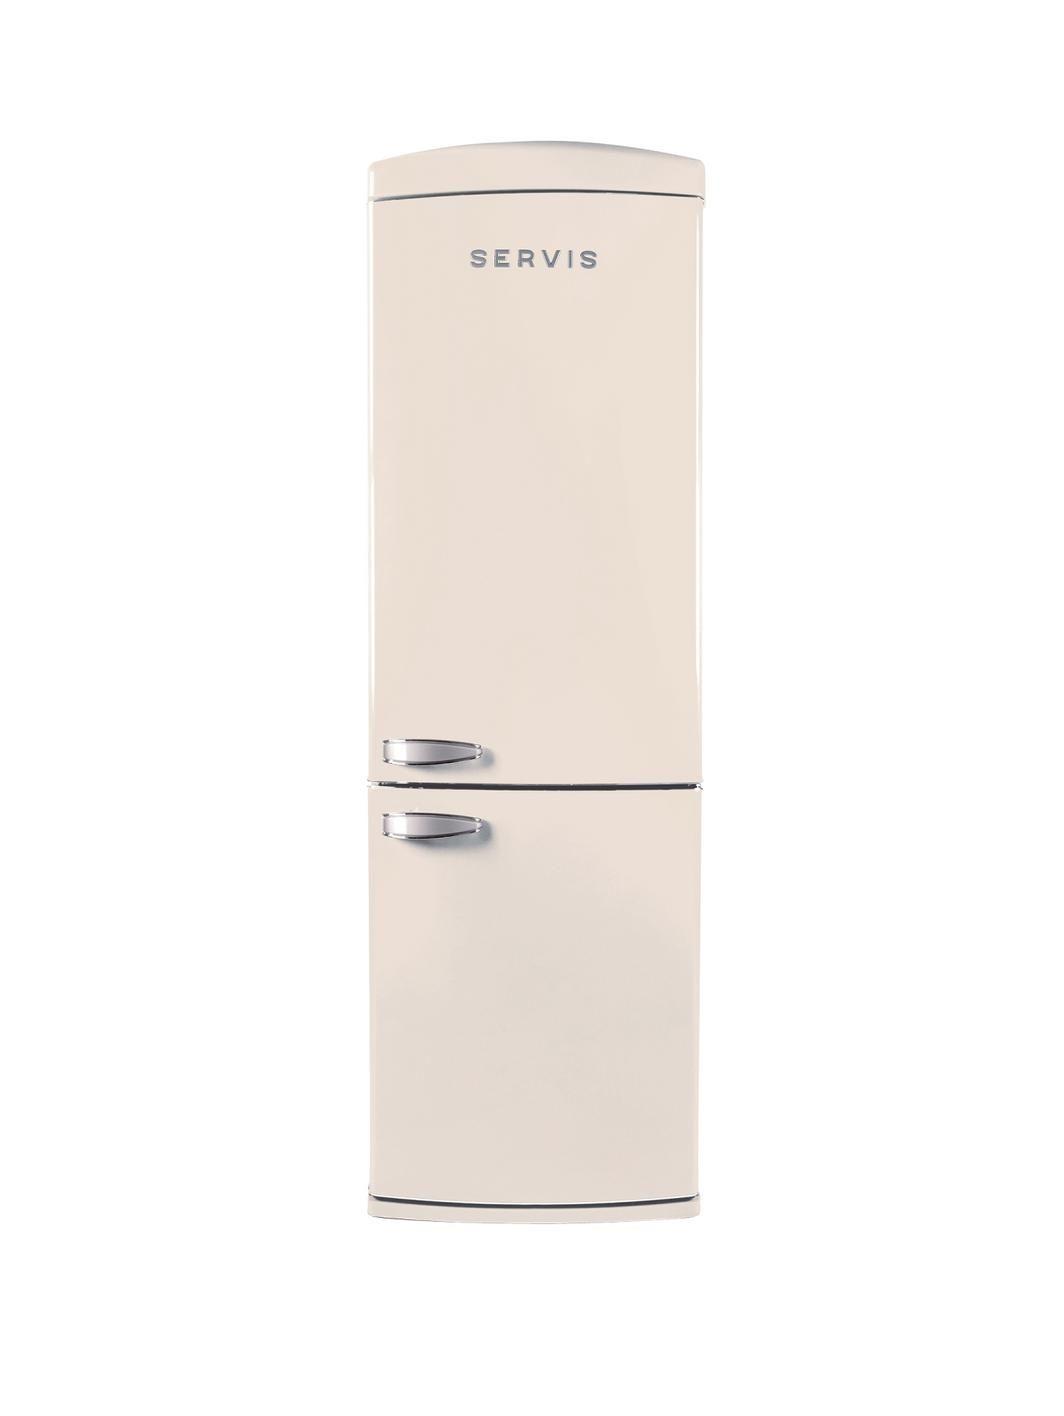 Very Womens Mens And Kids Fashion Furniture Electricals More Retro Fridge Retro Fridge Freezer Fridge Freezers